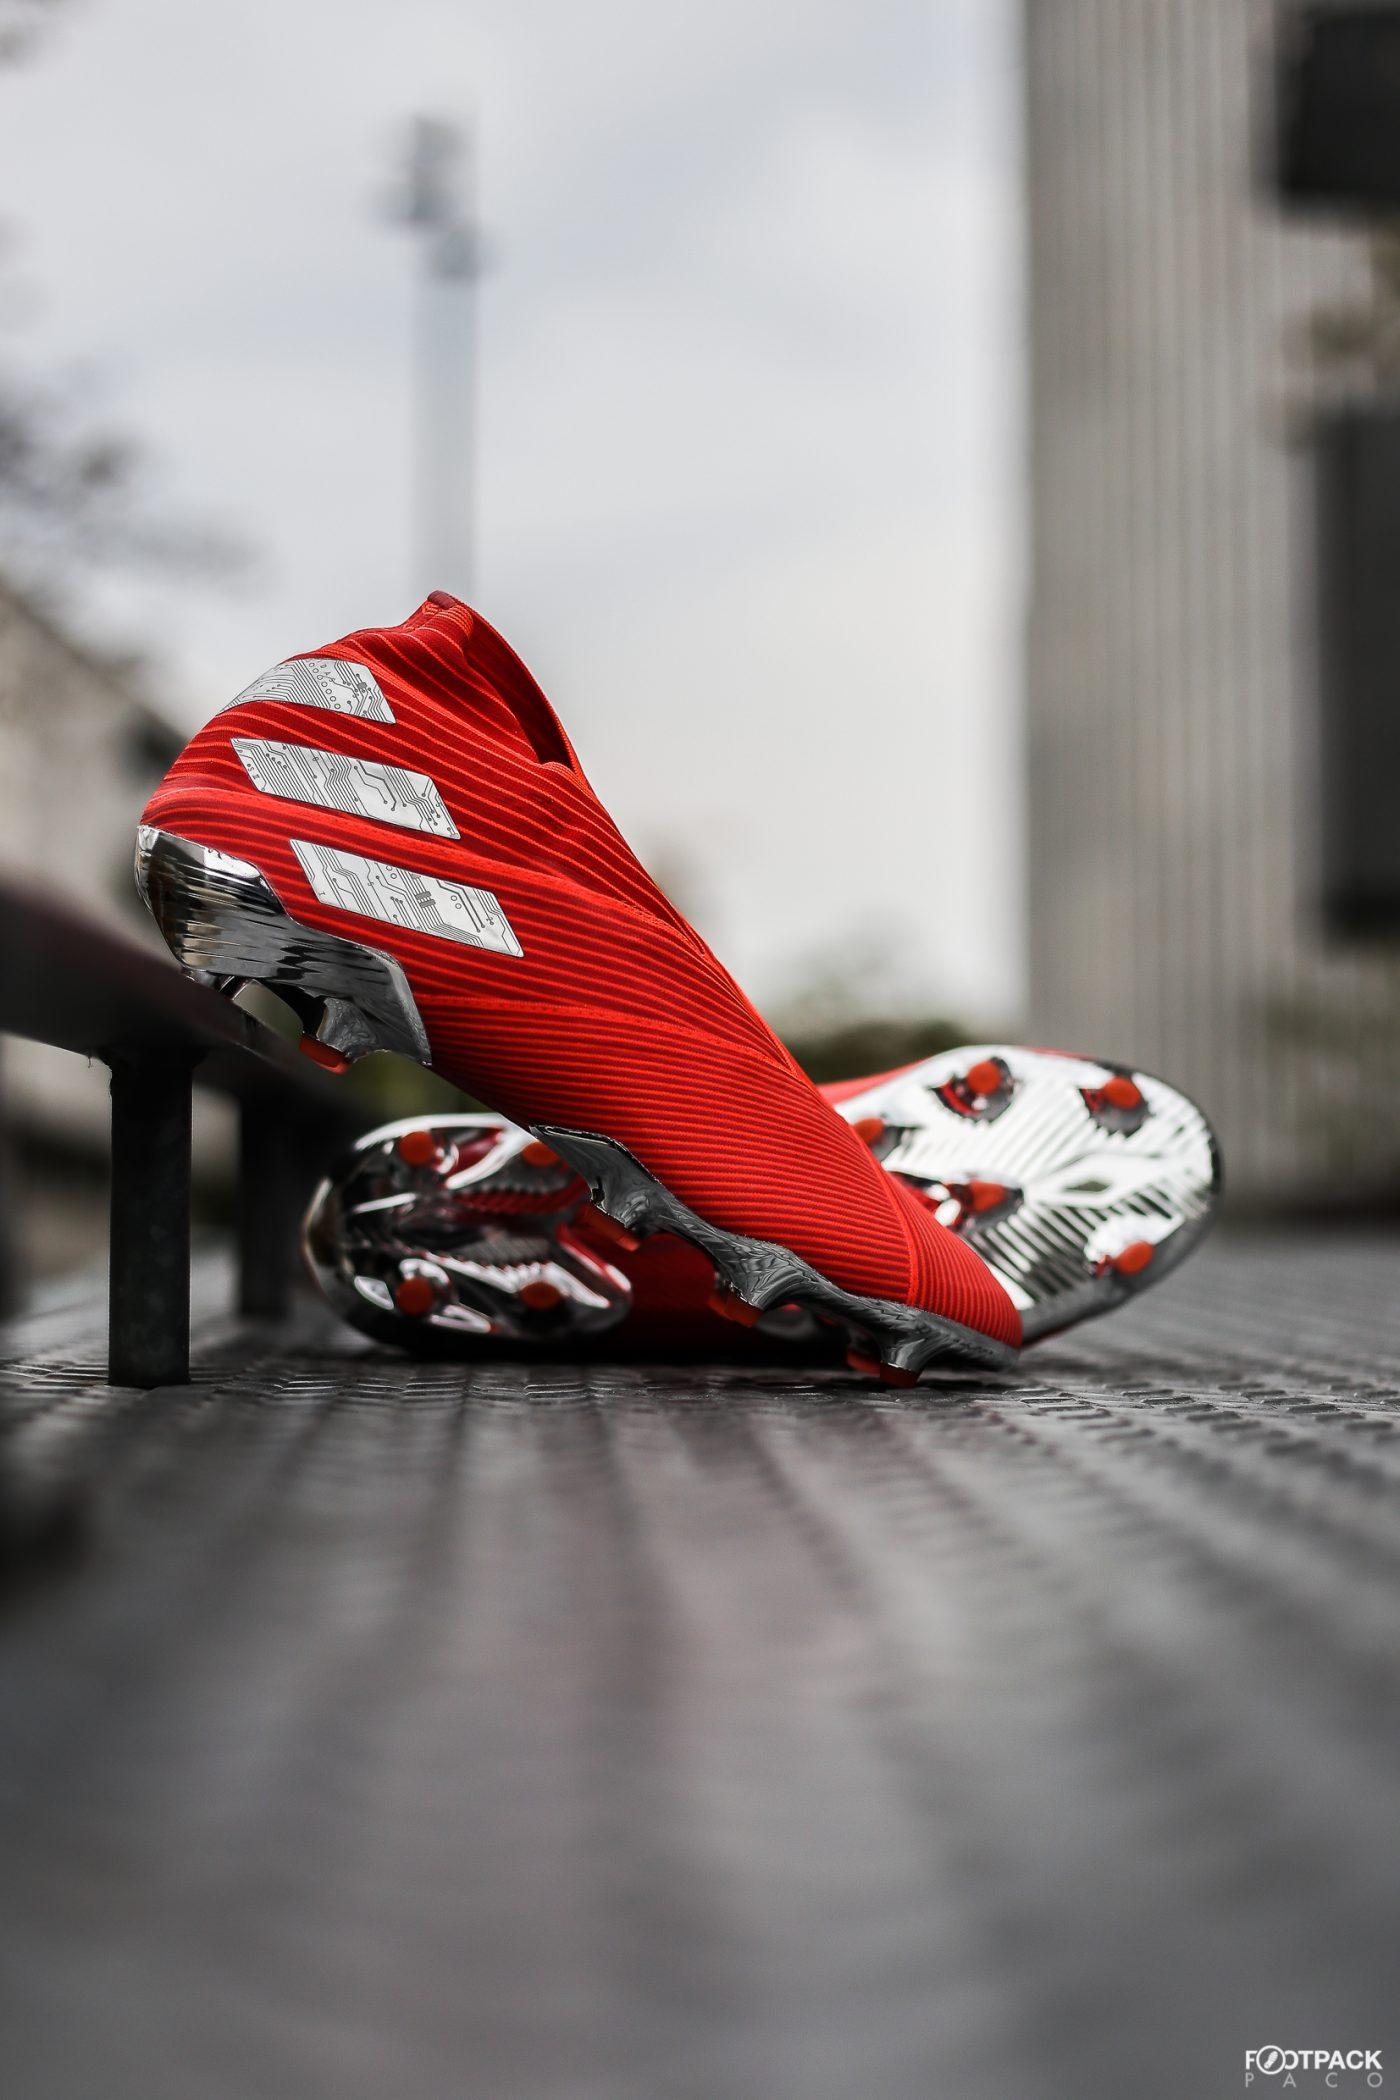 adidas-nemeziz-19-nemeziz19+-mai-2019-footpack-14